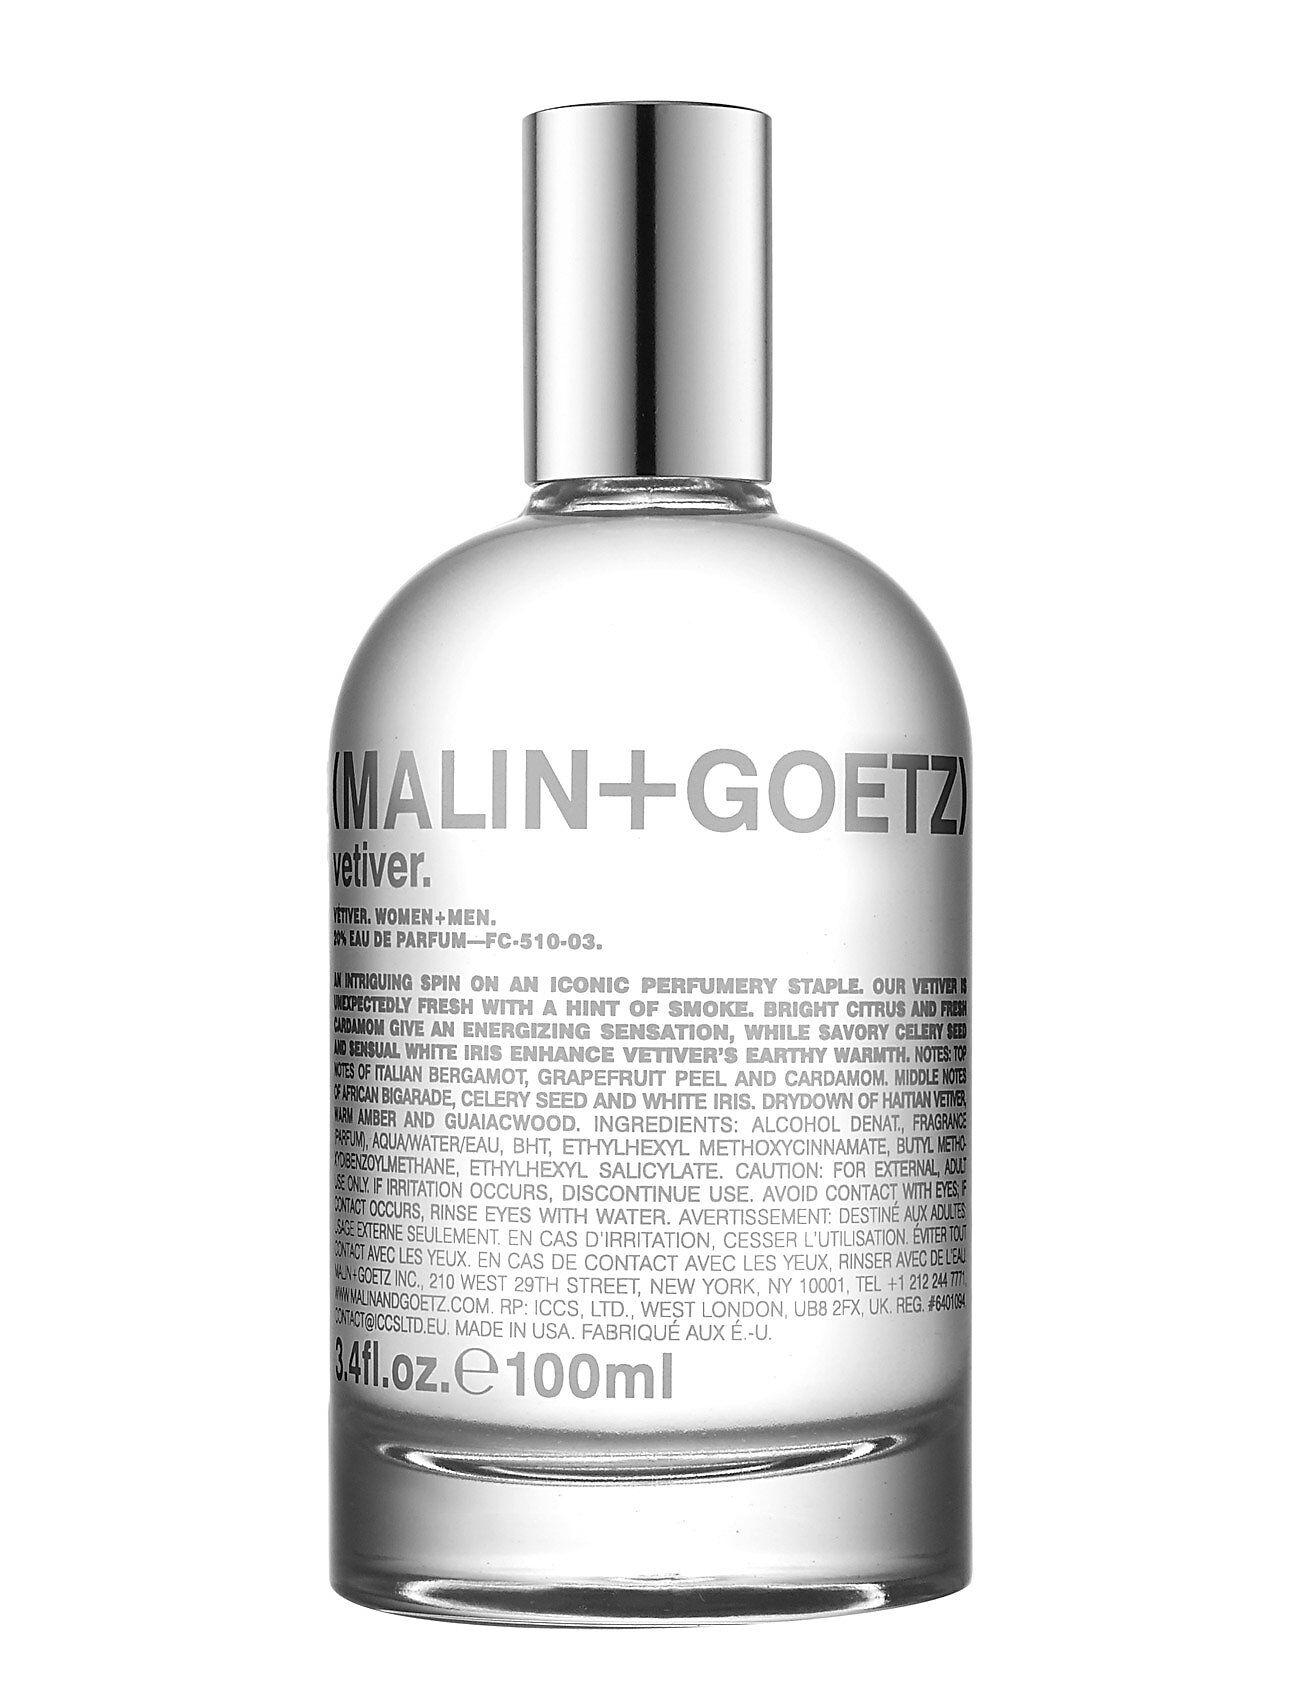 MALIN+GOETZ Vetiver Eau De Parfume Hajuvesi Eau De Parfum Nude MALIN+GOETZ